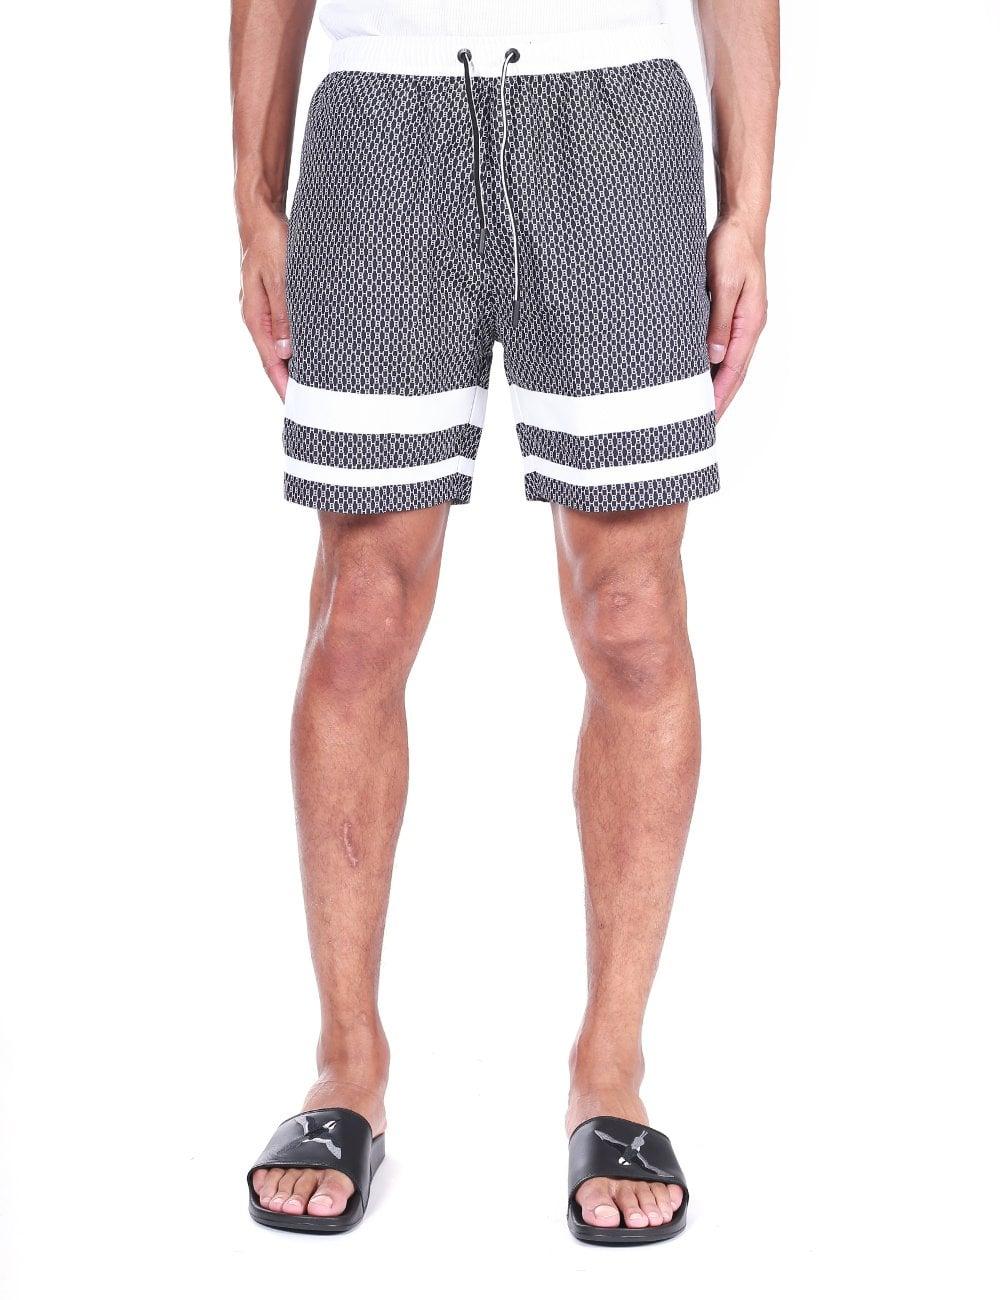 39b5c8a35816 Men's All-Over Monogram Print Quick-Dry Swim Shorts